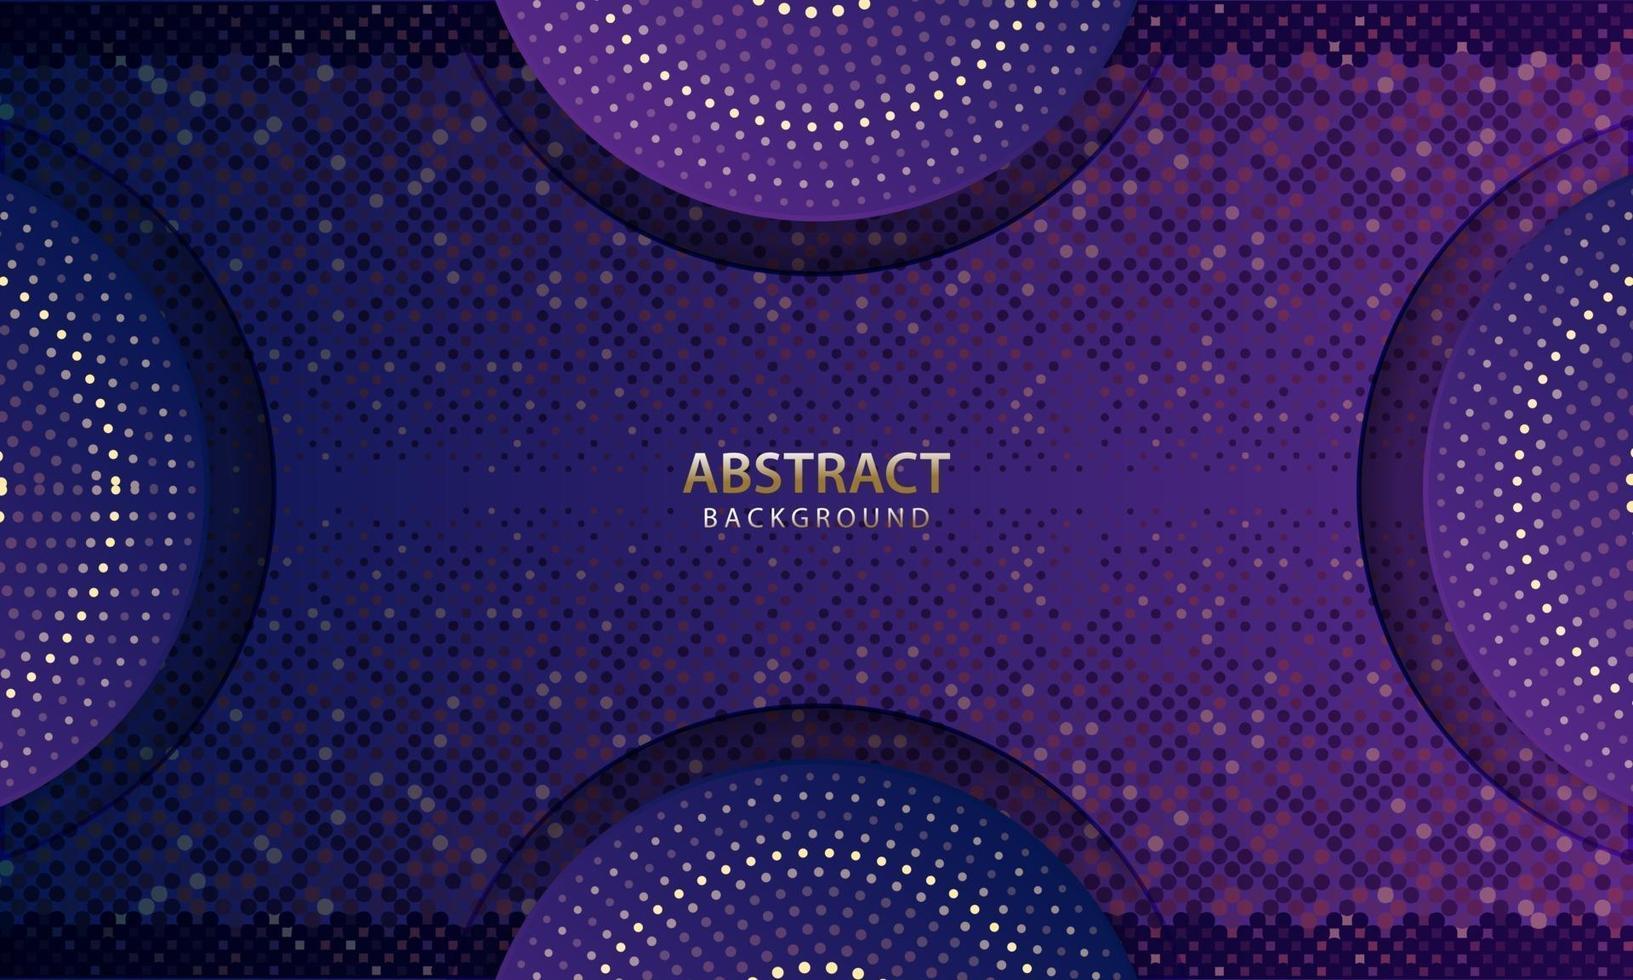 abstrakt futuristisk mörkblå bakgrund med glitter. 3d bakgrund. realistisk vektorillustration. vektor